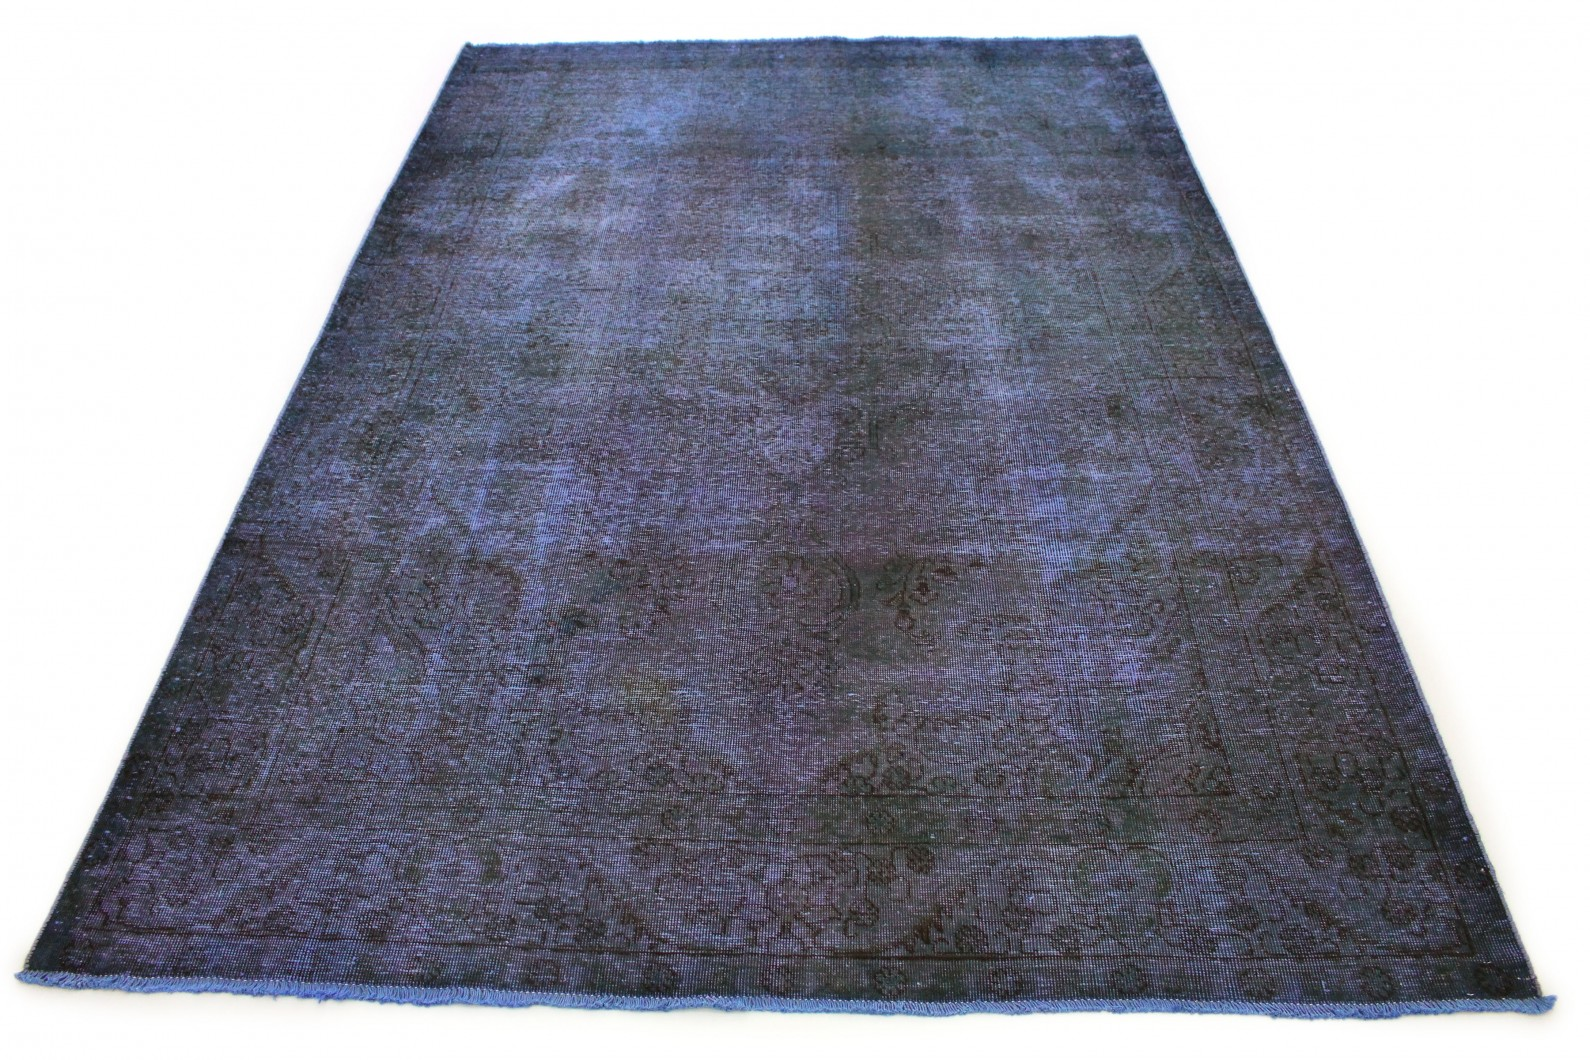 Carpetido Design Vintage-Teppich Blau Lila in 290x200 (1 / 5)